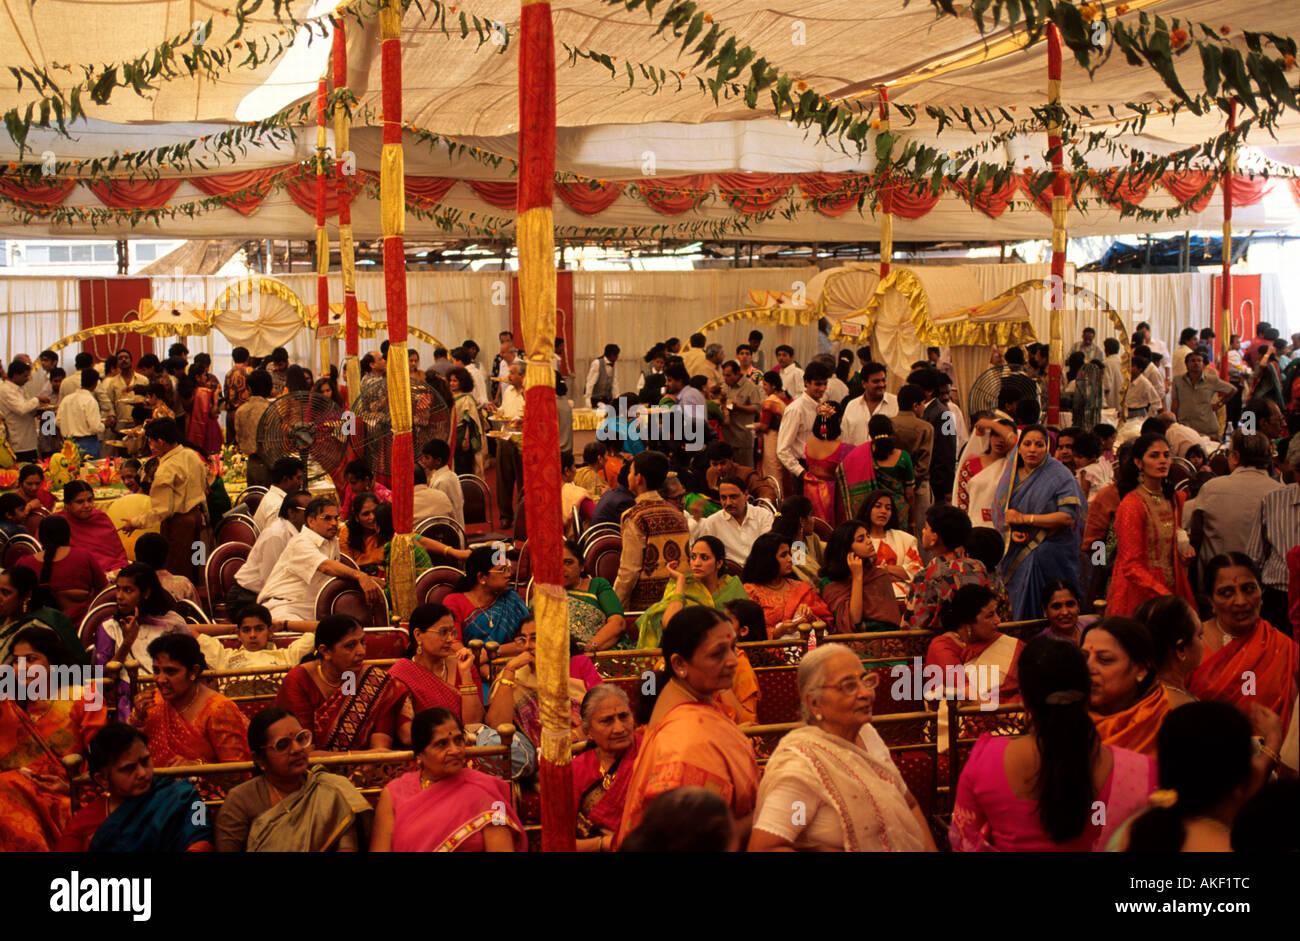 Indien, Mumbai, Hochzeitsfeier Stock Photo